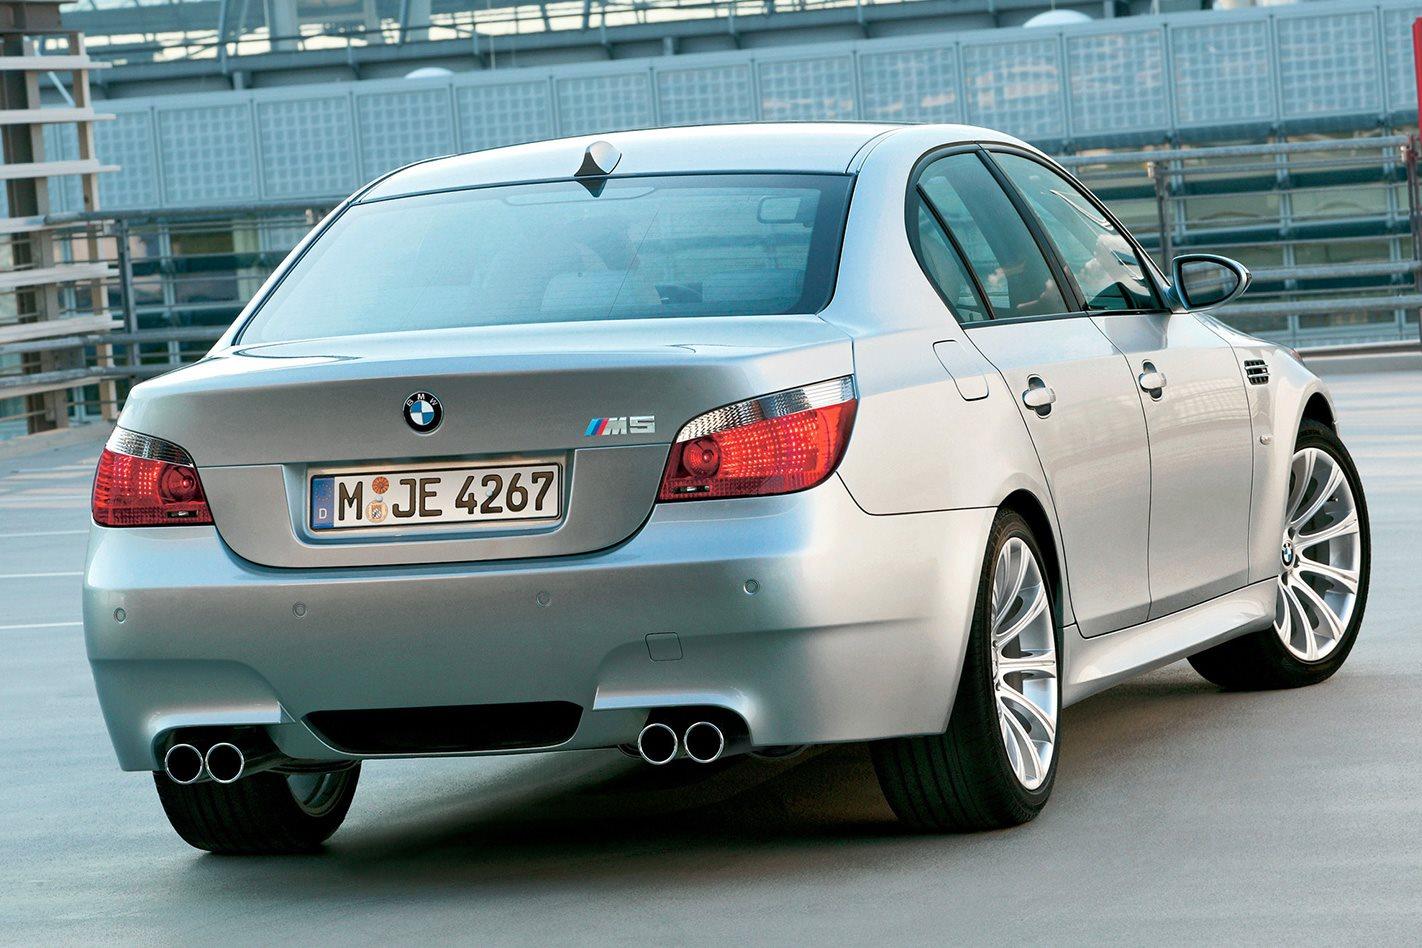 2005 E60 BMW M5 tailights